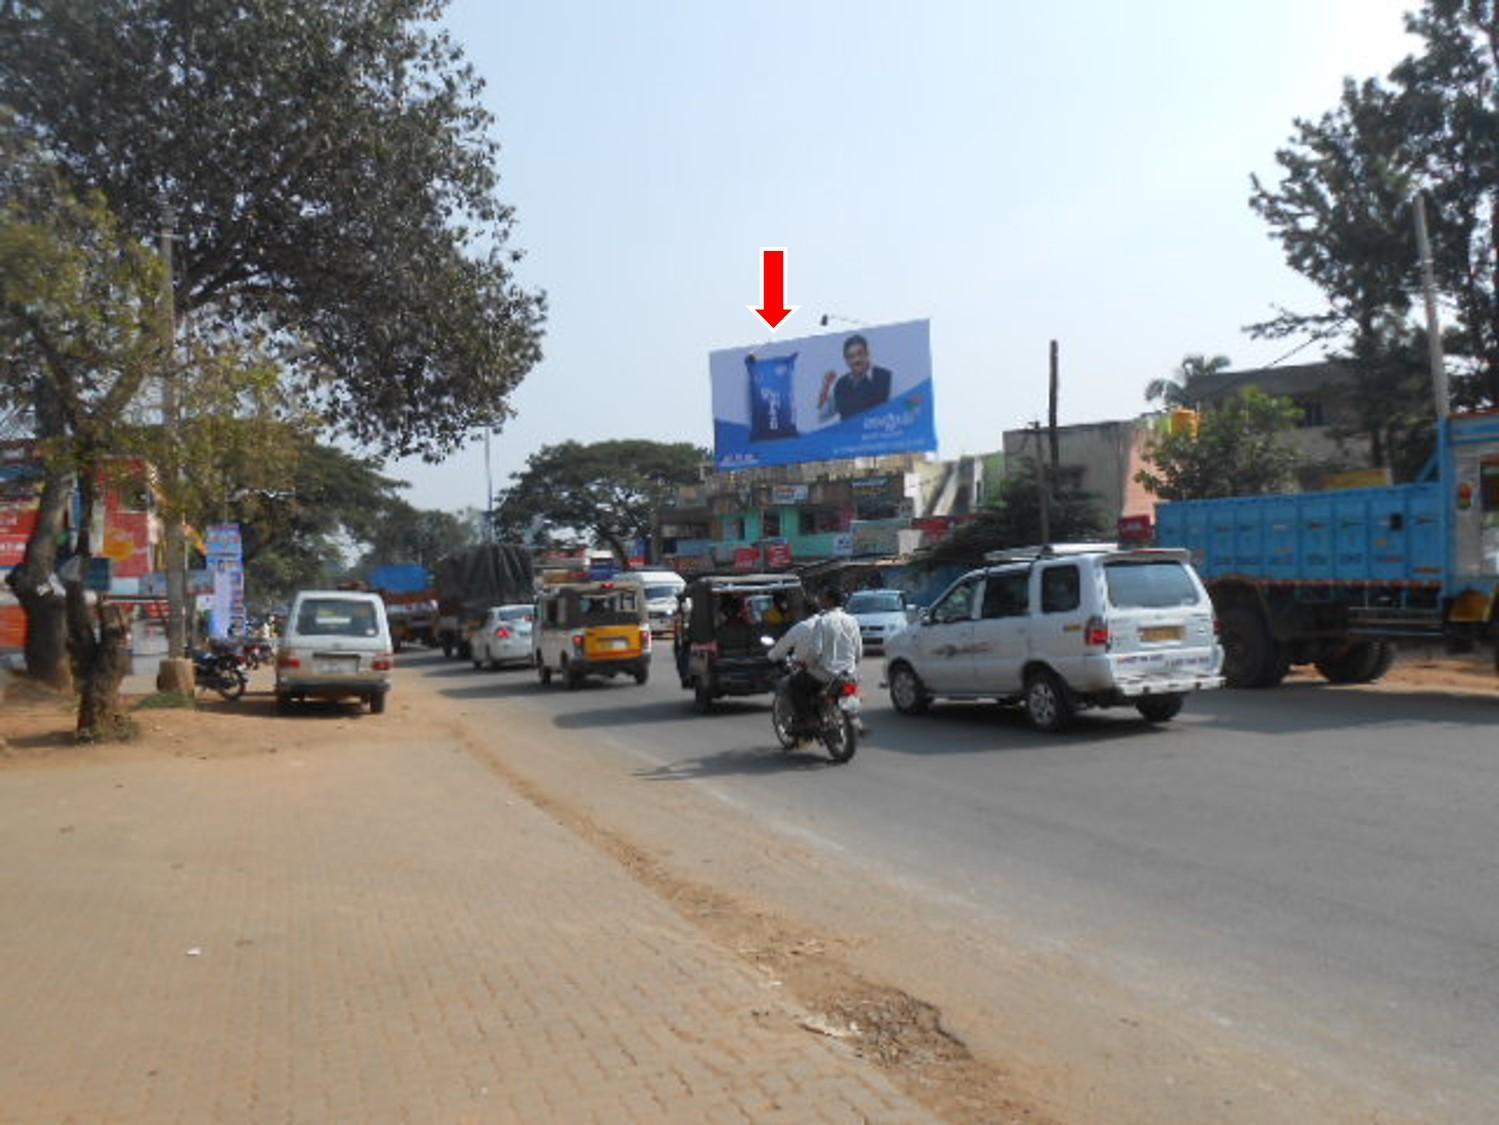 Doddaballapura, D Cross, Bangalore